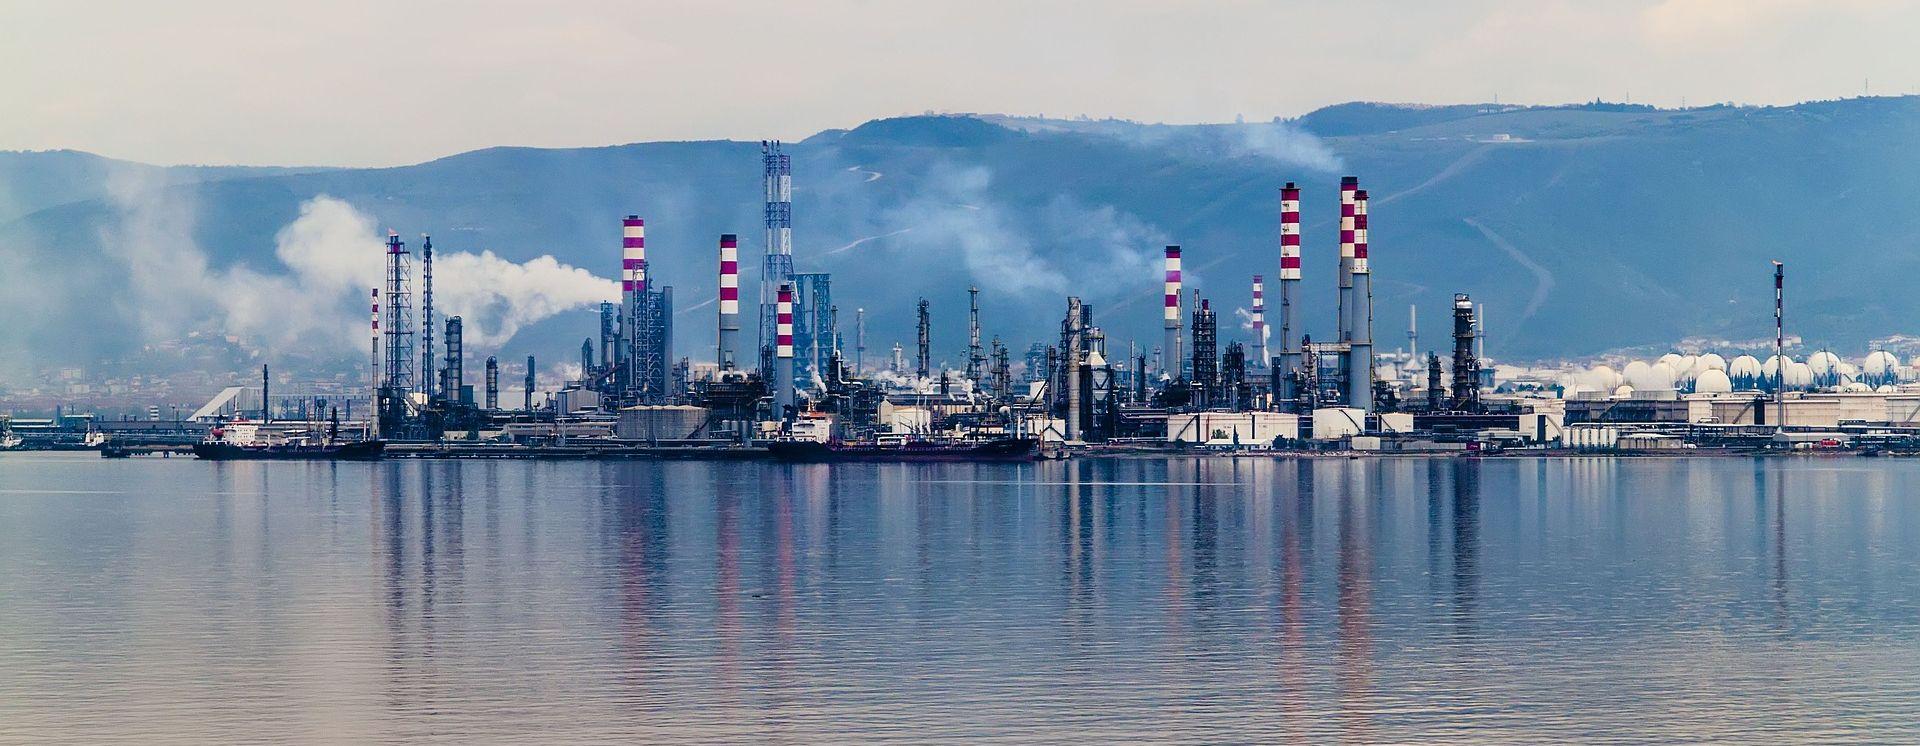 Ina obustavila isporuku plina Petrokemiji